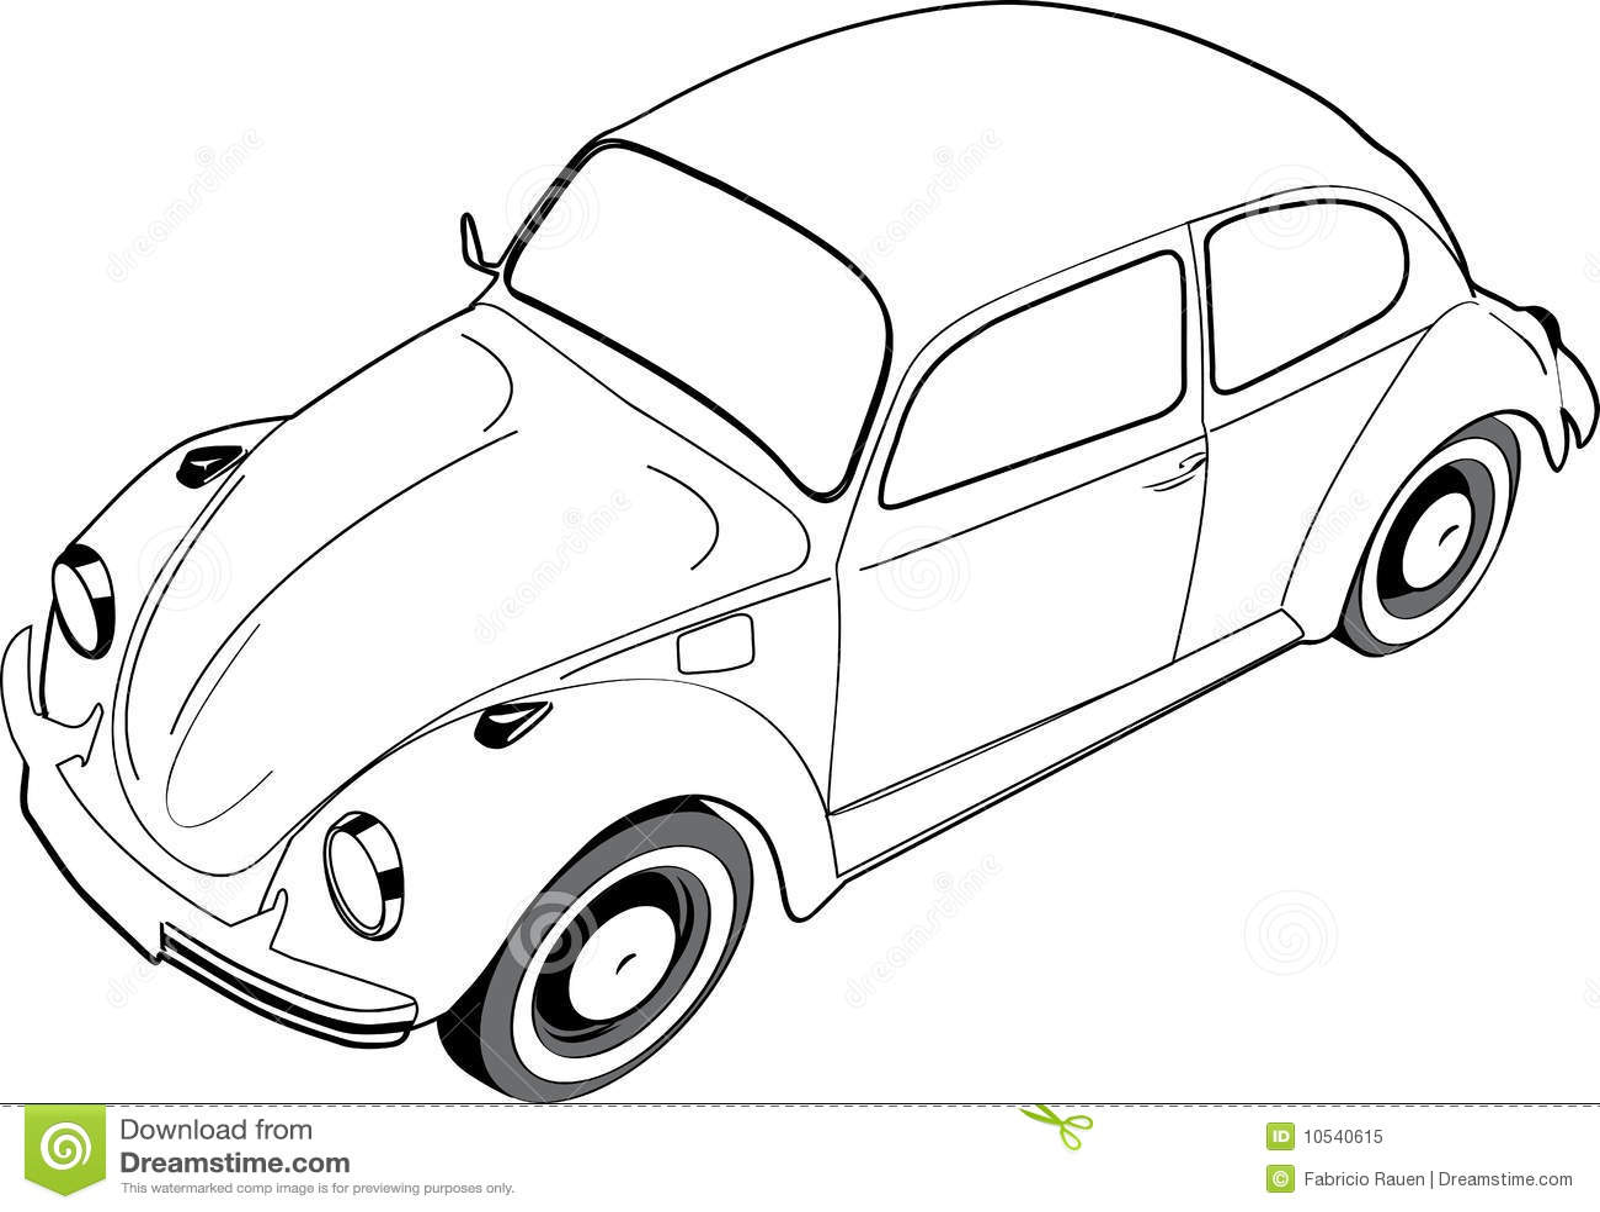 volkswagon beetle or bug royalty free stock photo